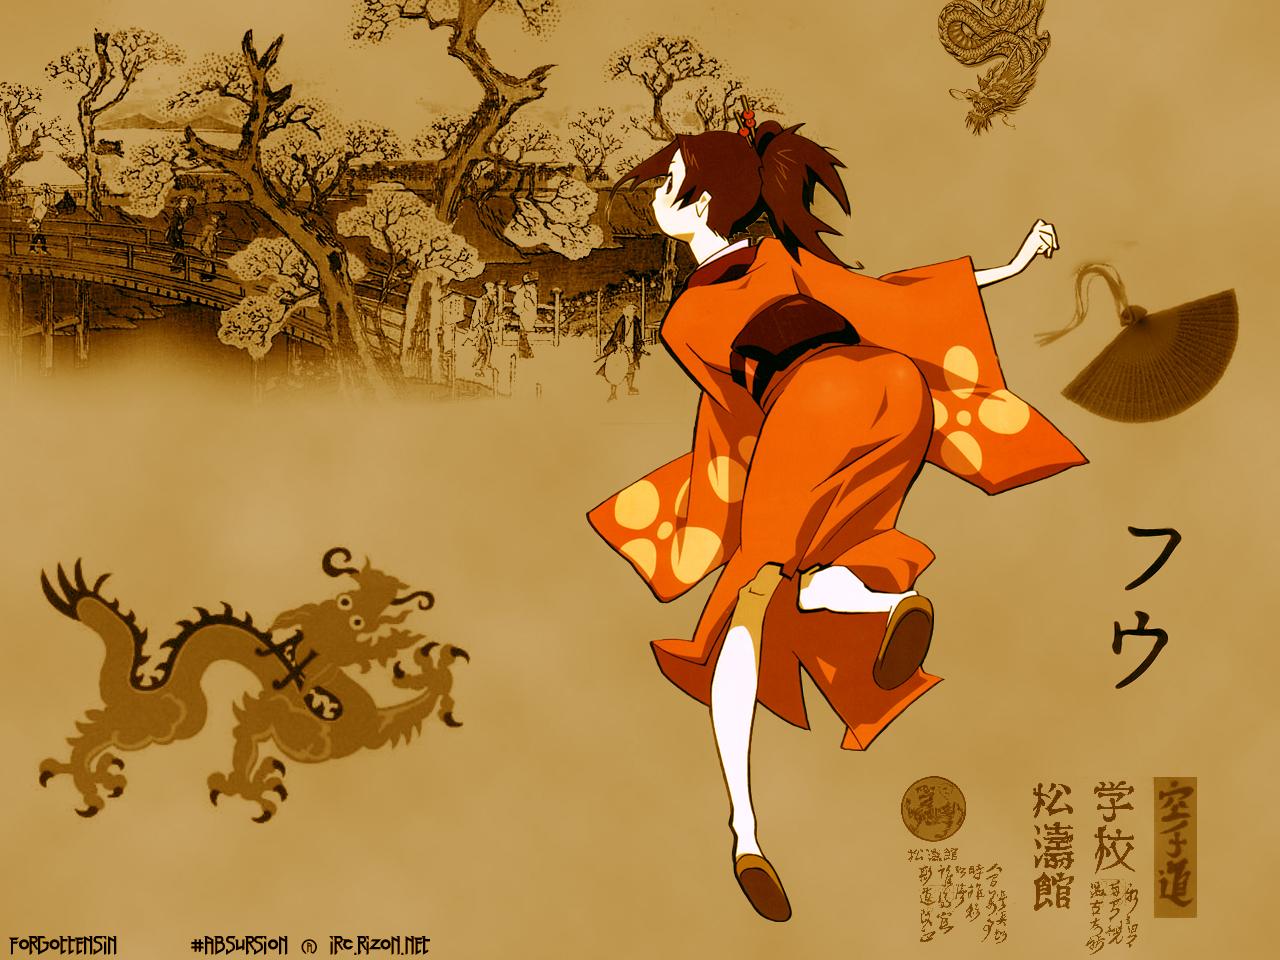 Samurai Champloo Wallpaper: Fuu's Amazing Journey - Minitokyo